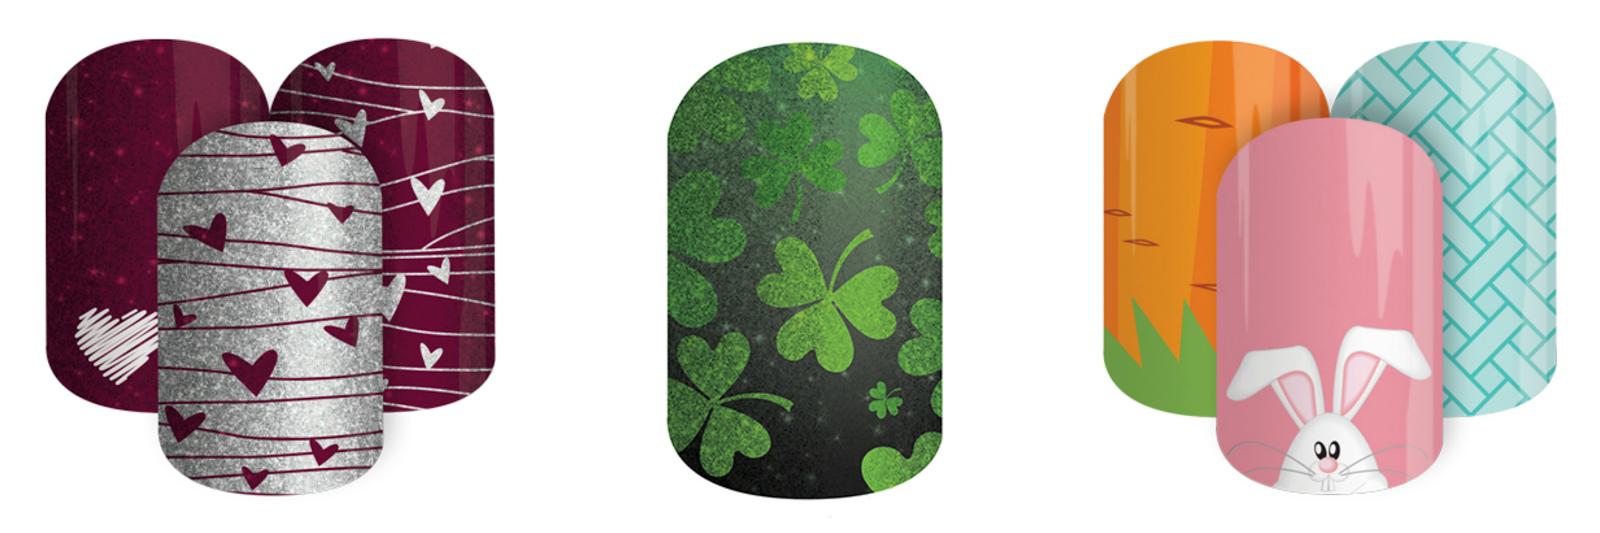 Jamberry nails seasonal designs